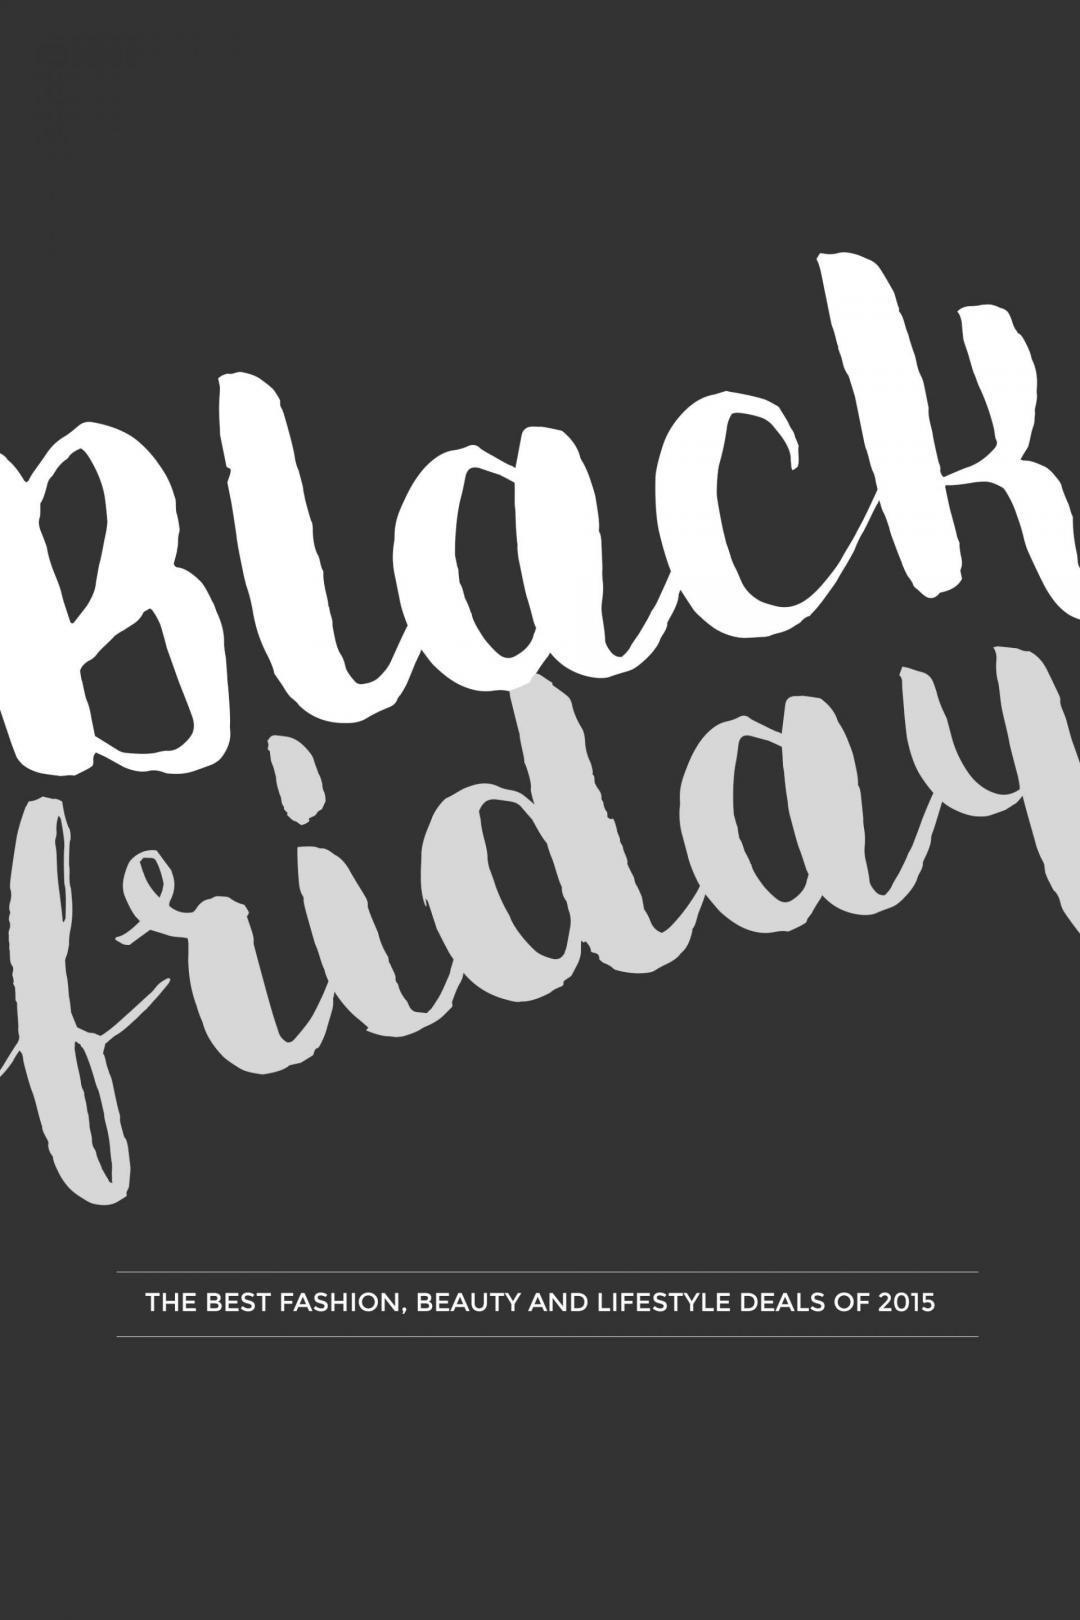 black-friday-2015-deals-and-bargains